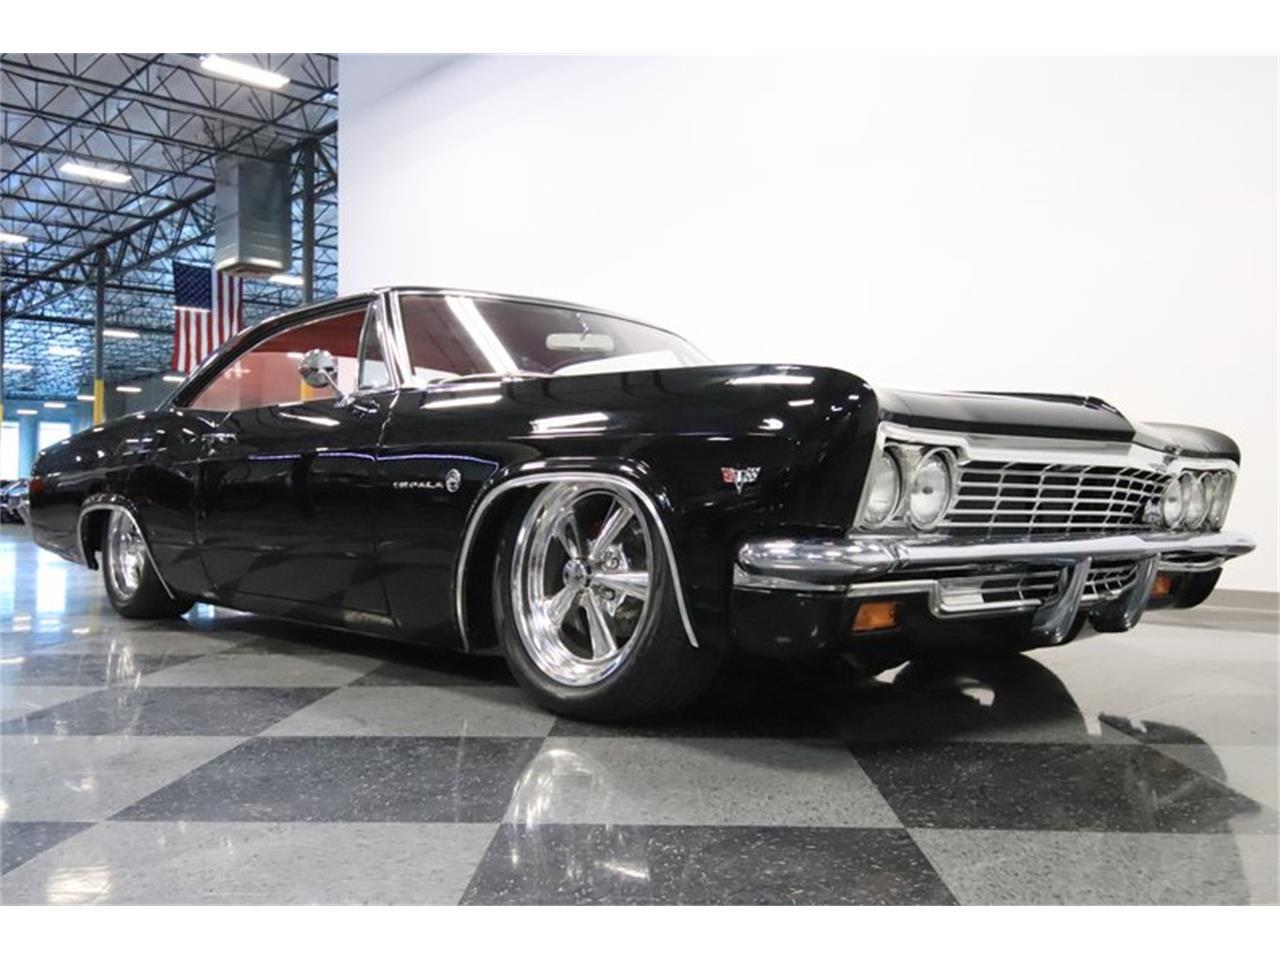 Large Picture of Classic 1966 Impala located in Mesa Arizona - $52,995.00 - Q2EF